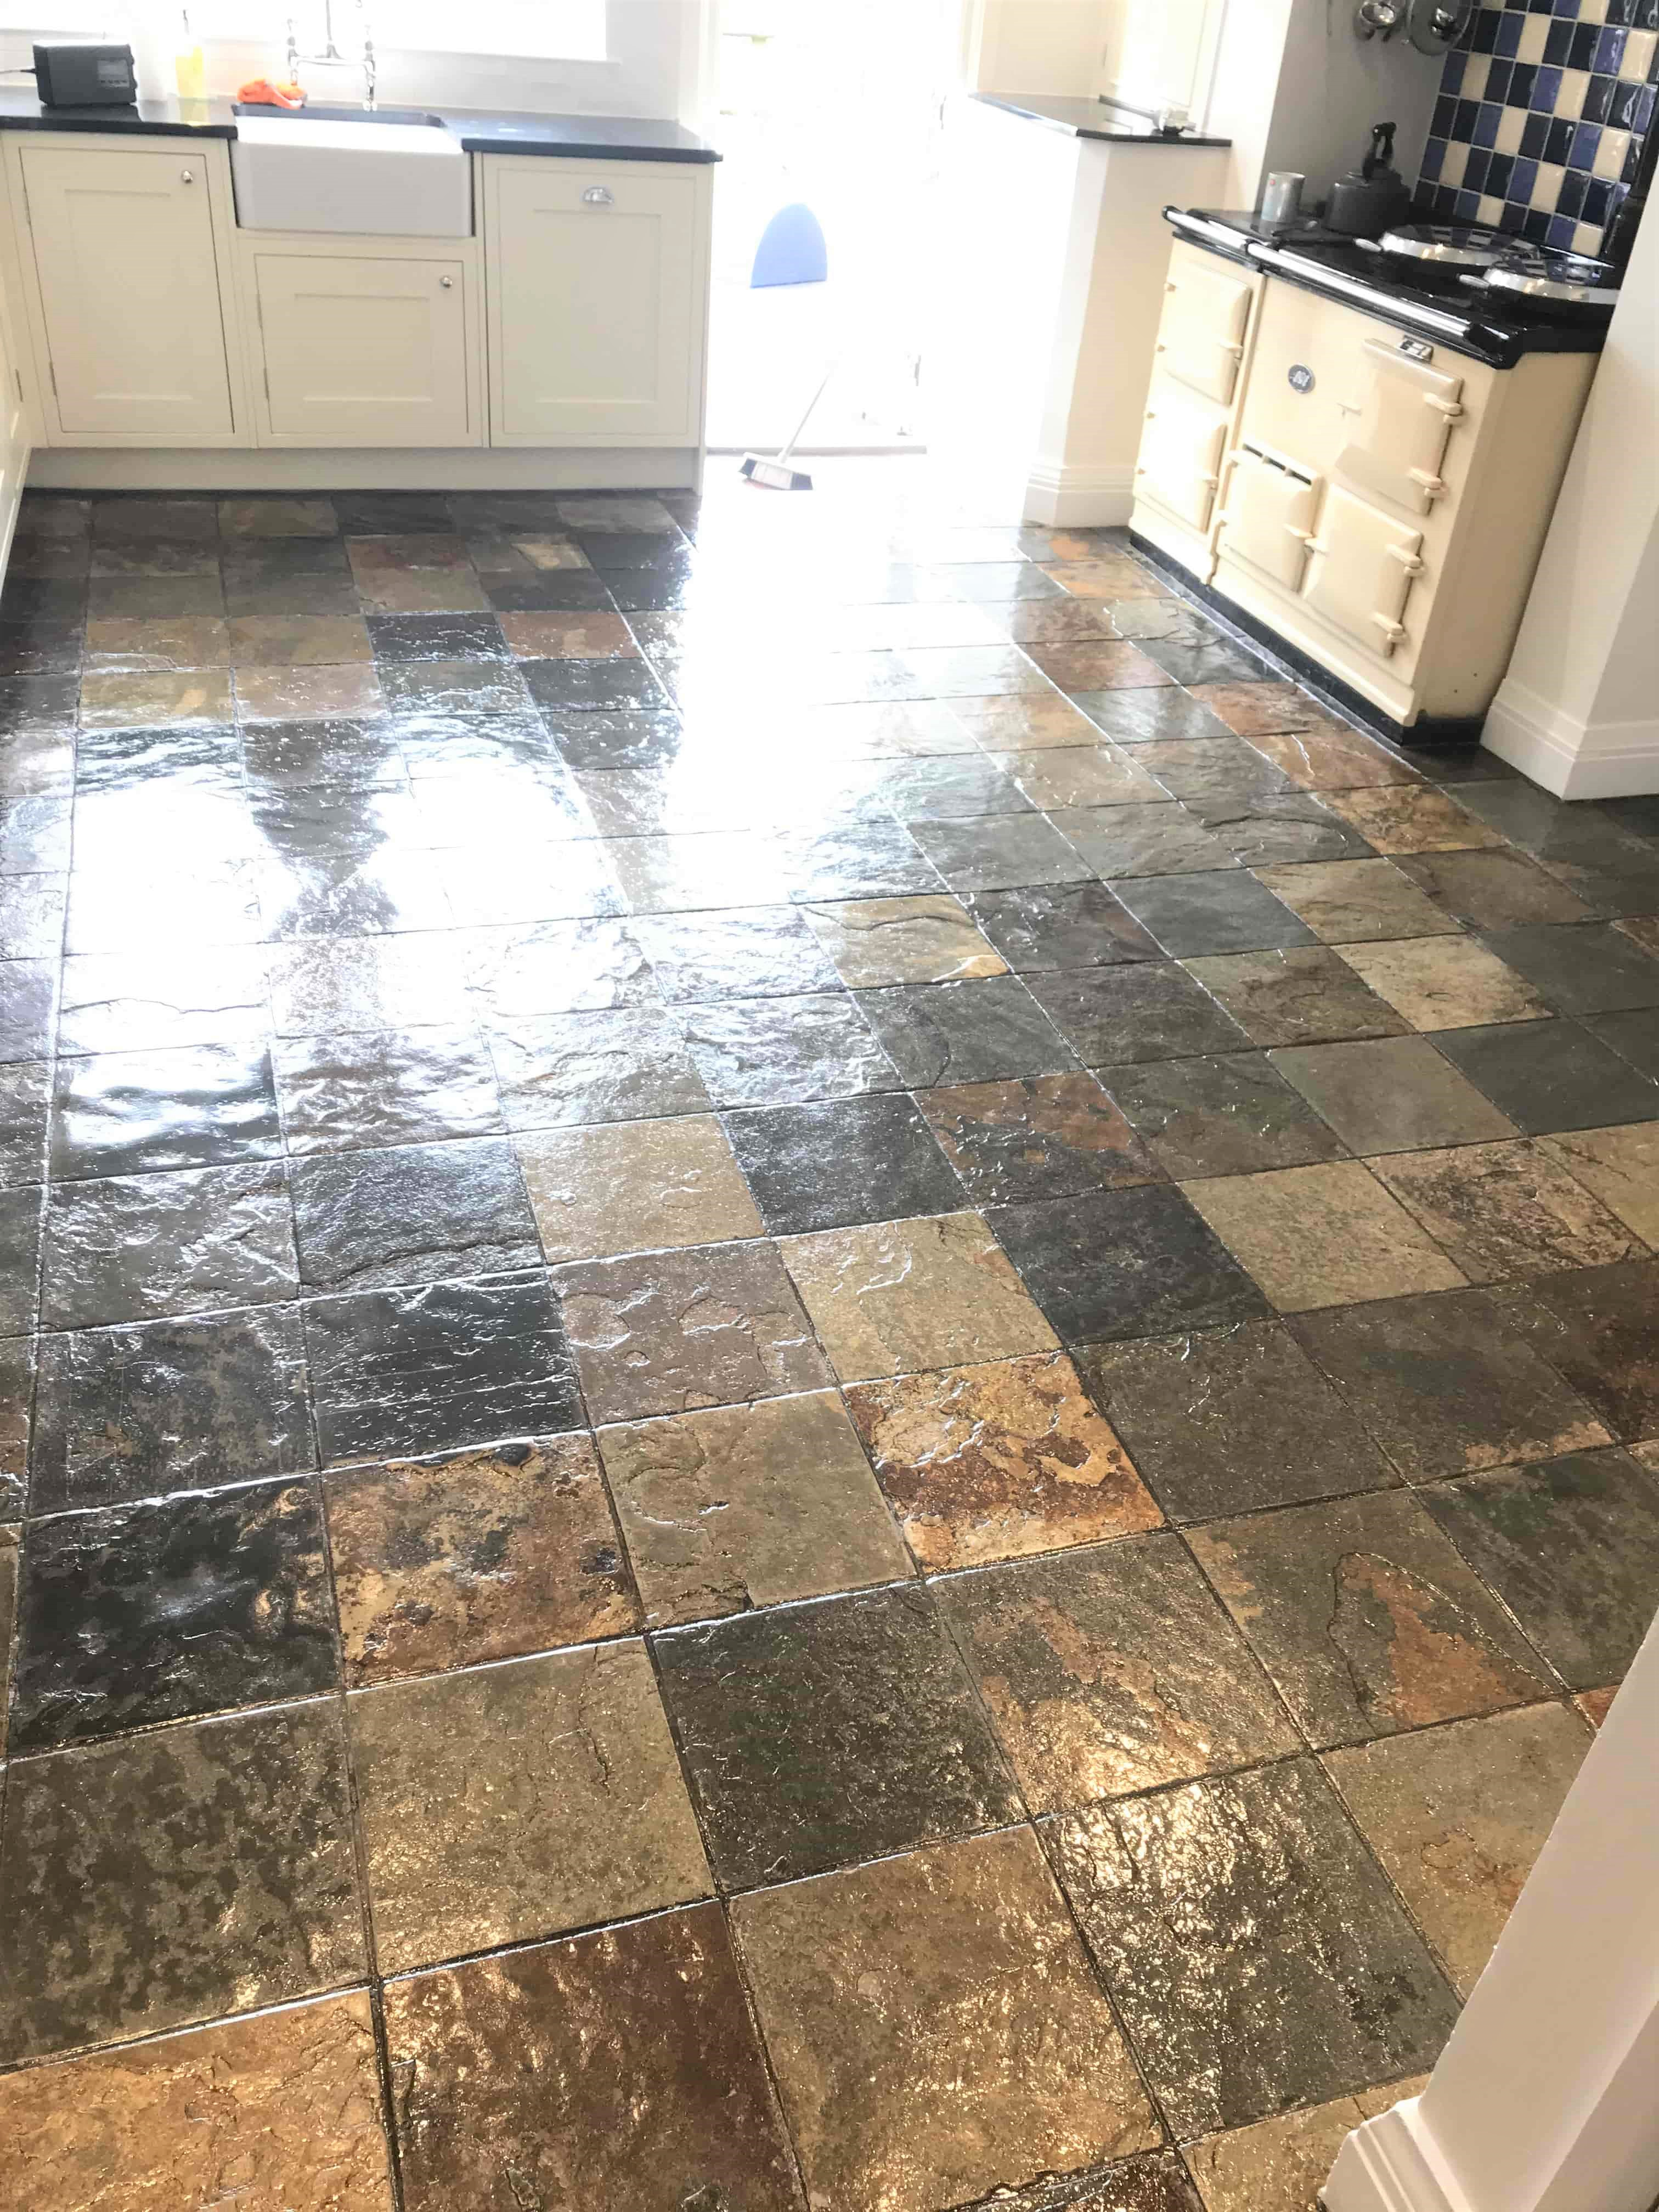 Removing Varnish From Slate Floor Tiles In Cragg Vale Calderdale